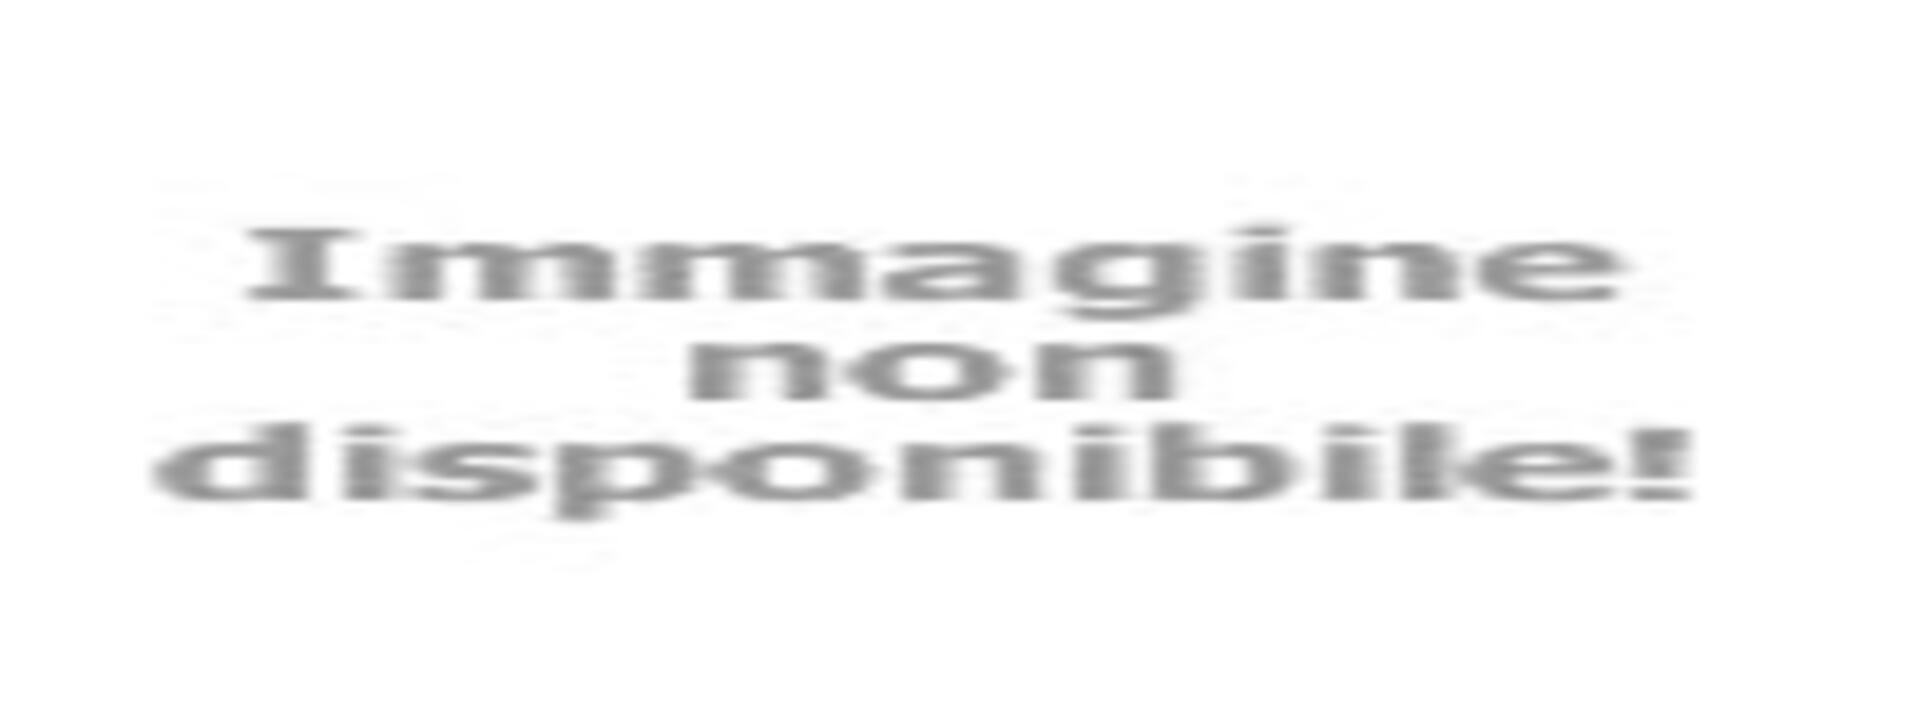 sangregorioresidencehotel it recensioni 004